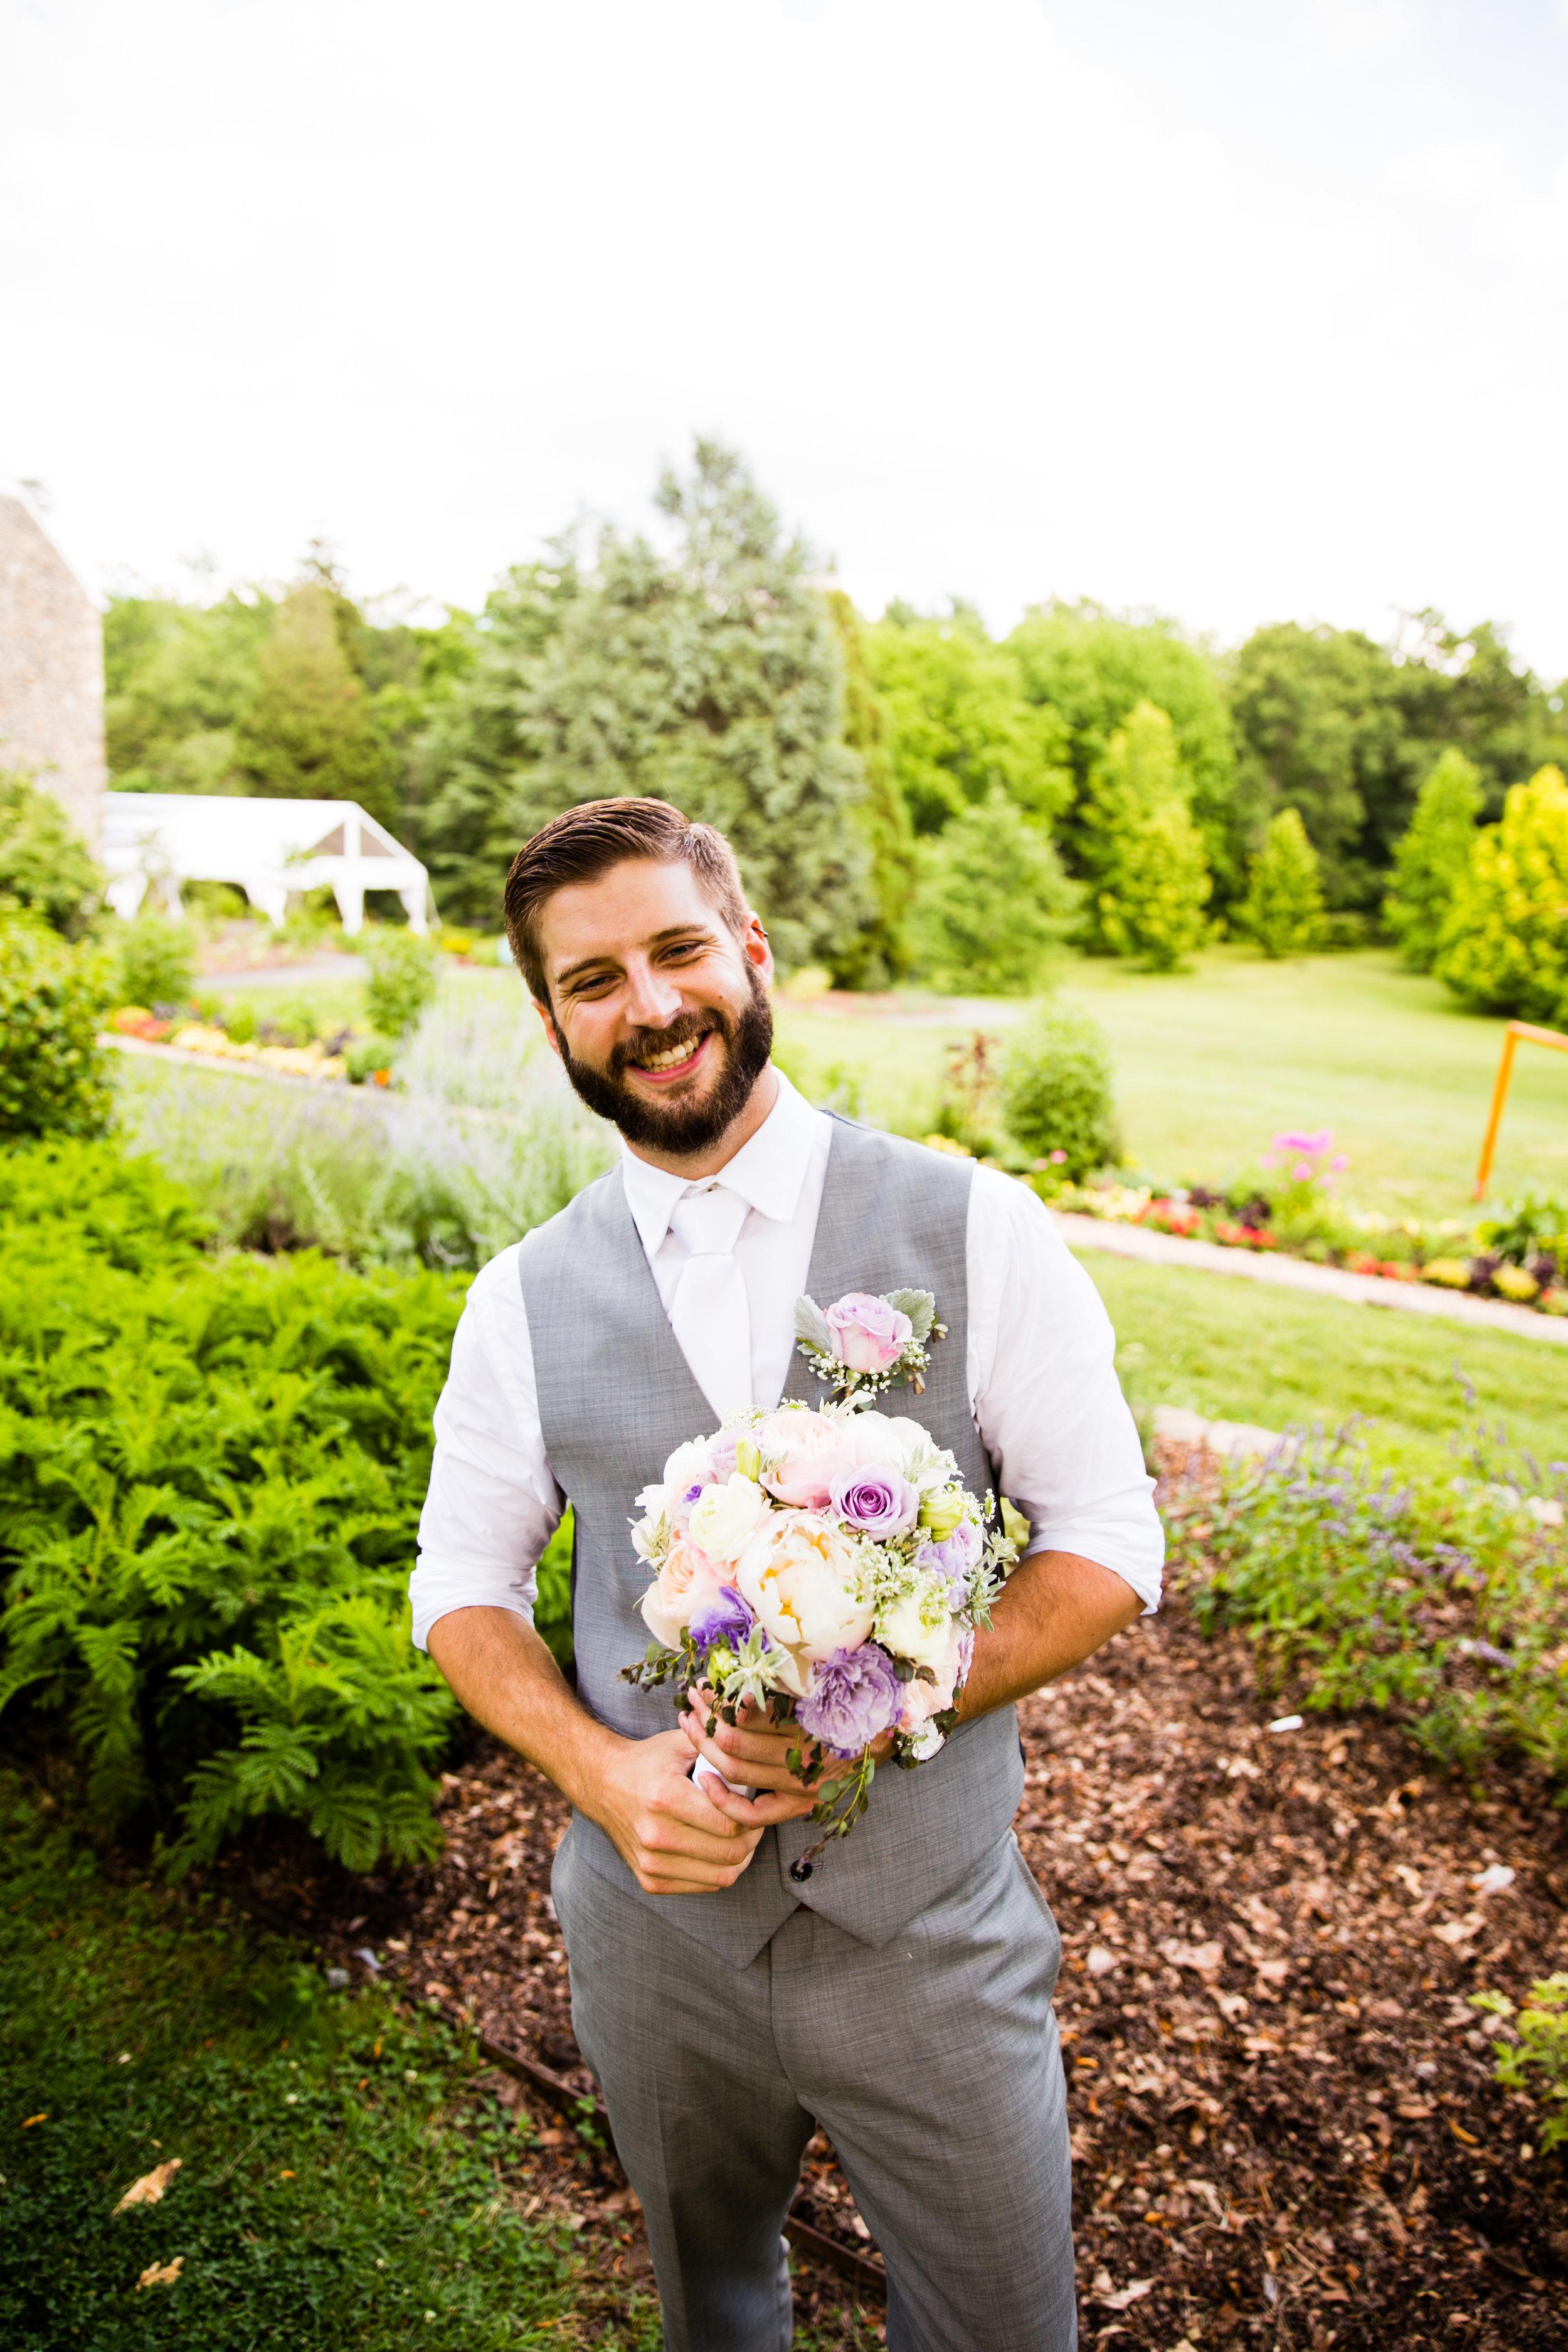 TYLER ARBORETUM WEDDING PHOTOGRAPHY LOVESTRUCK PICTURES-042.jpg